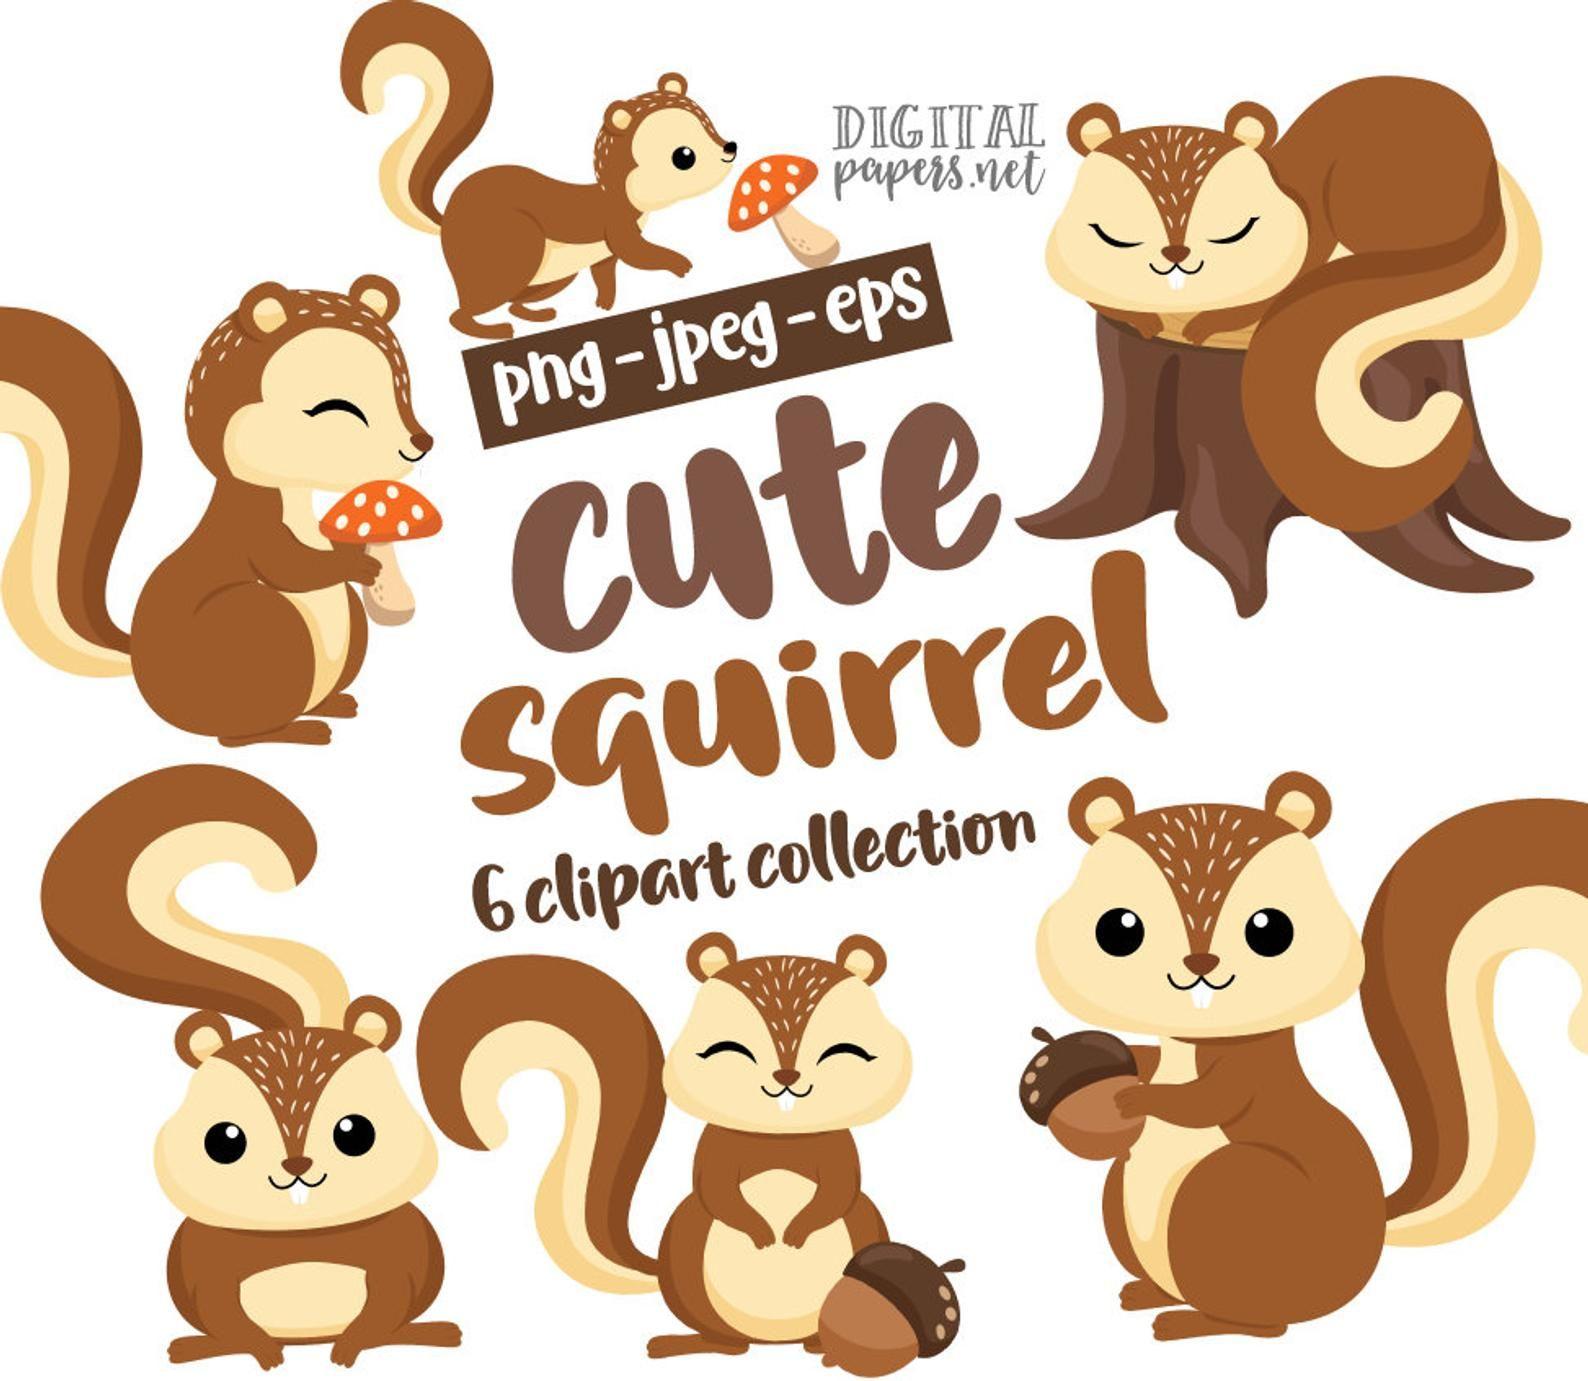 Squirrel Clipart Woodland Animals Fall Graphics Woodland Etsy Squirrel Clipart Clip Art Cute Squirrel